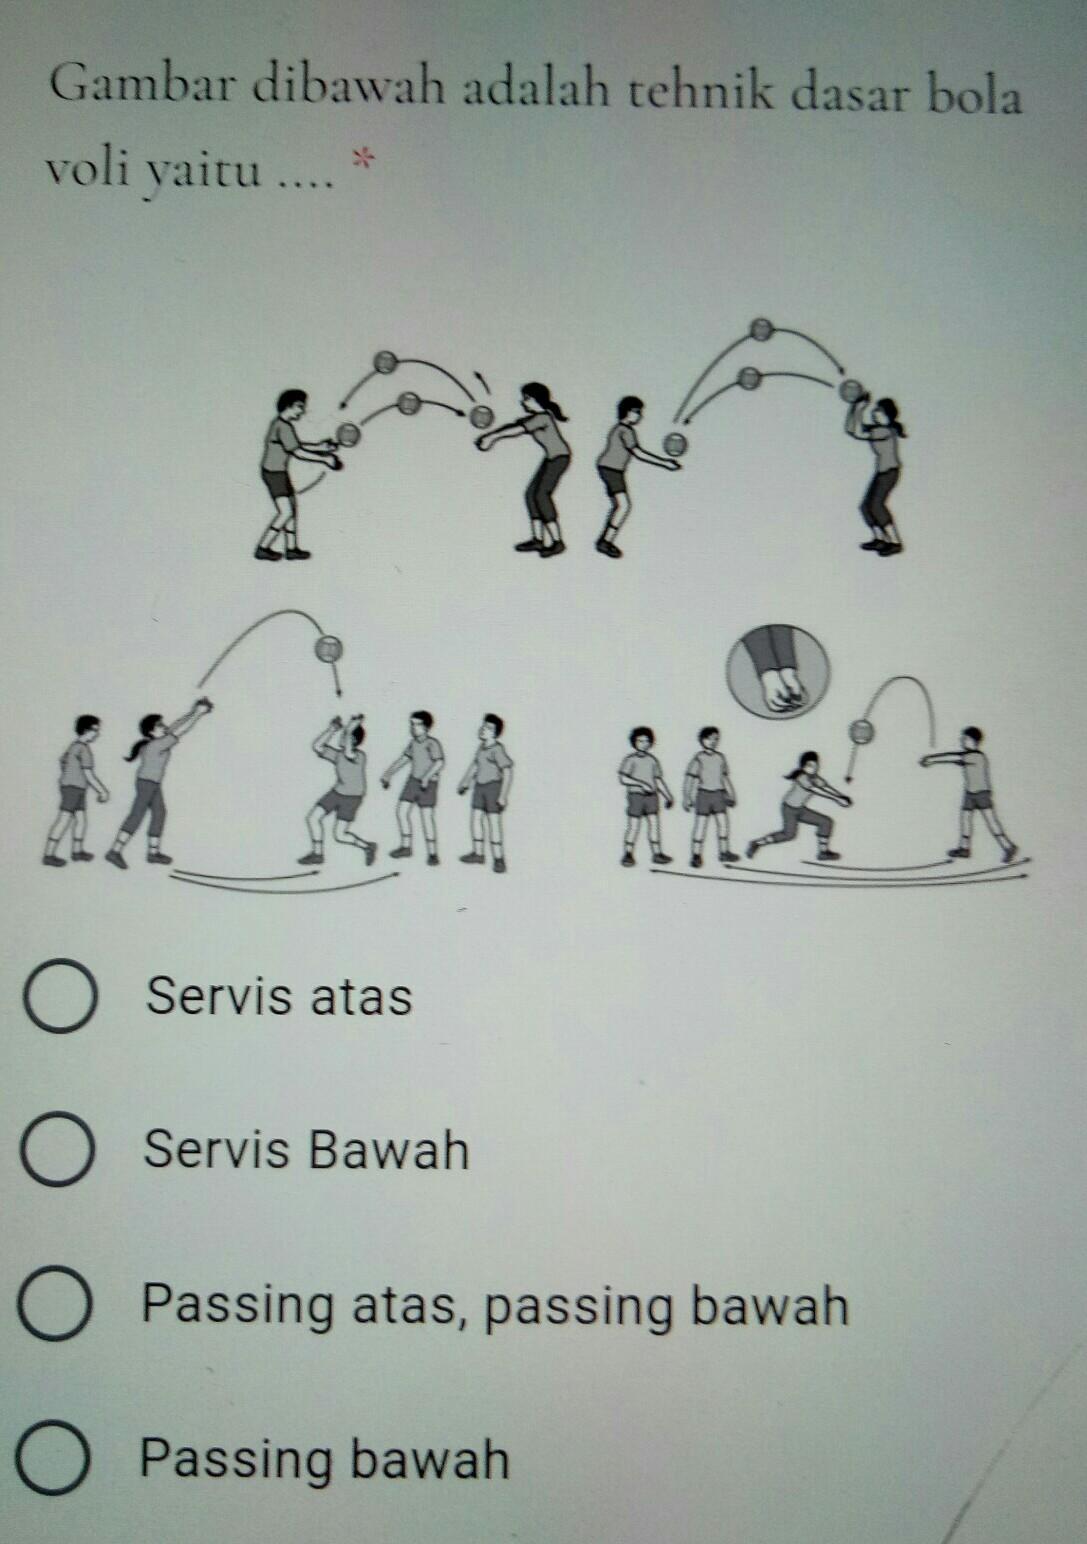 Gambar Servis Bawah Bola Voli : gambar, servis, bawah, Gambar, Dibawah, Adalah, Tehnik, Dasar, Bolavoli, Yaitu..